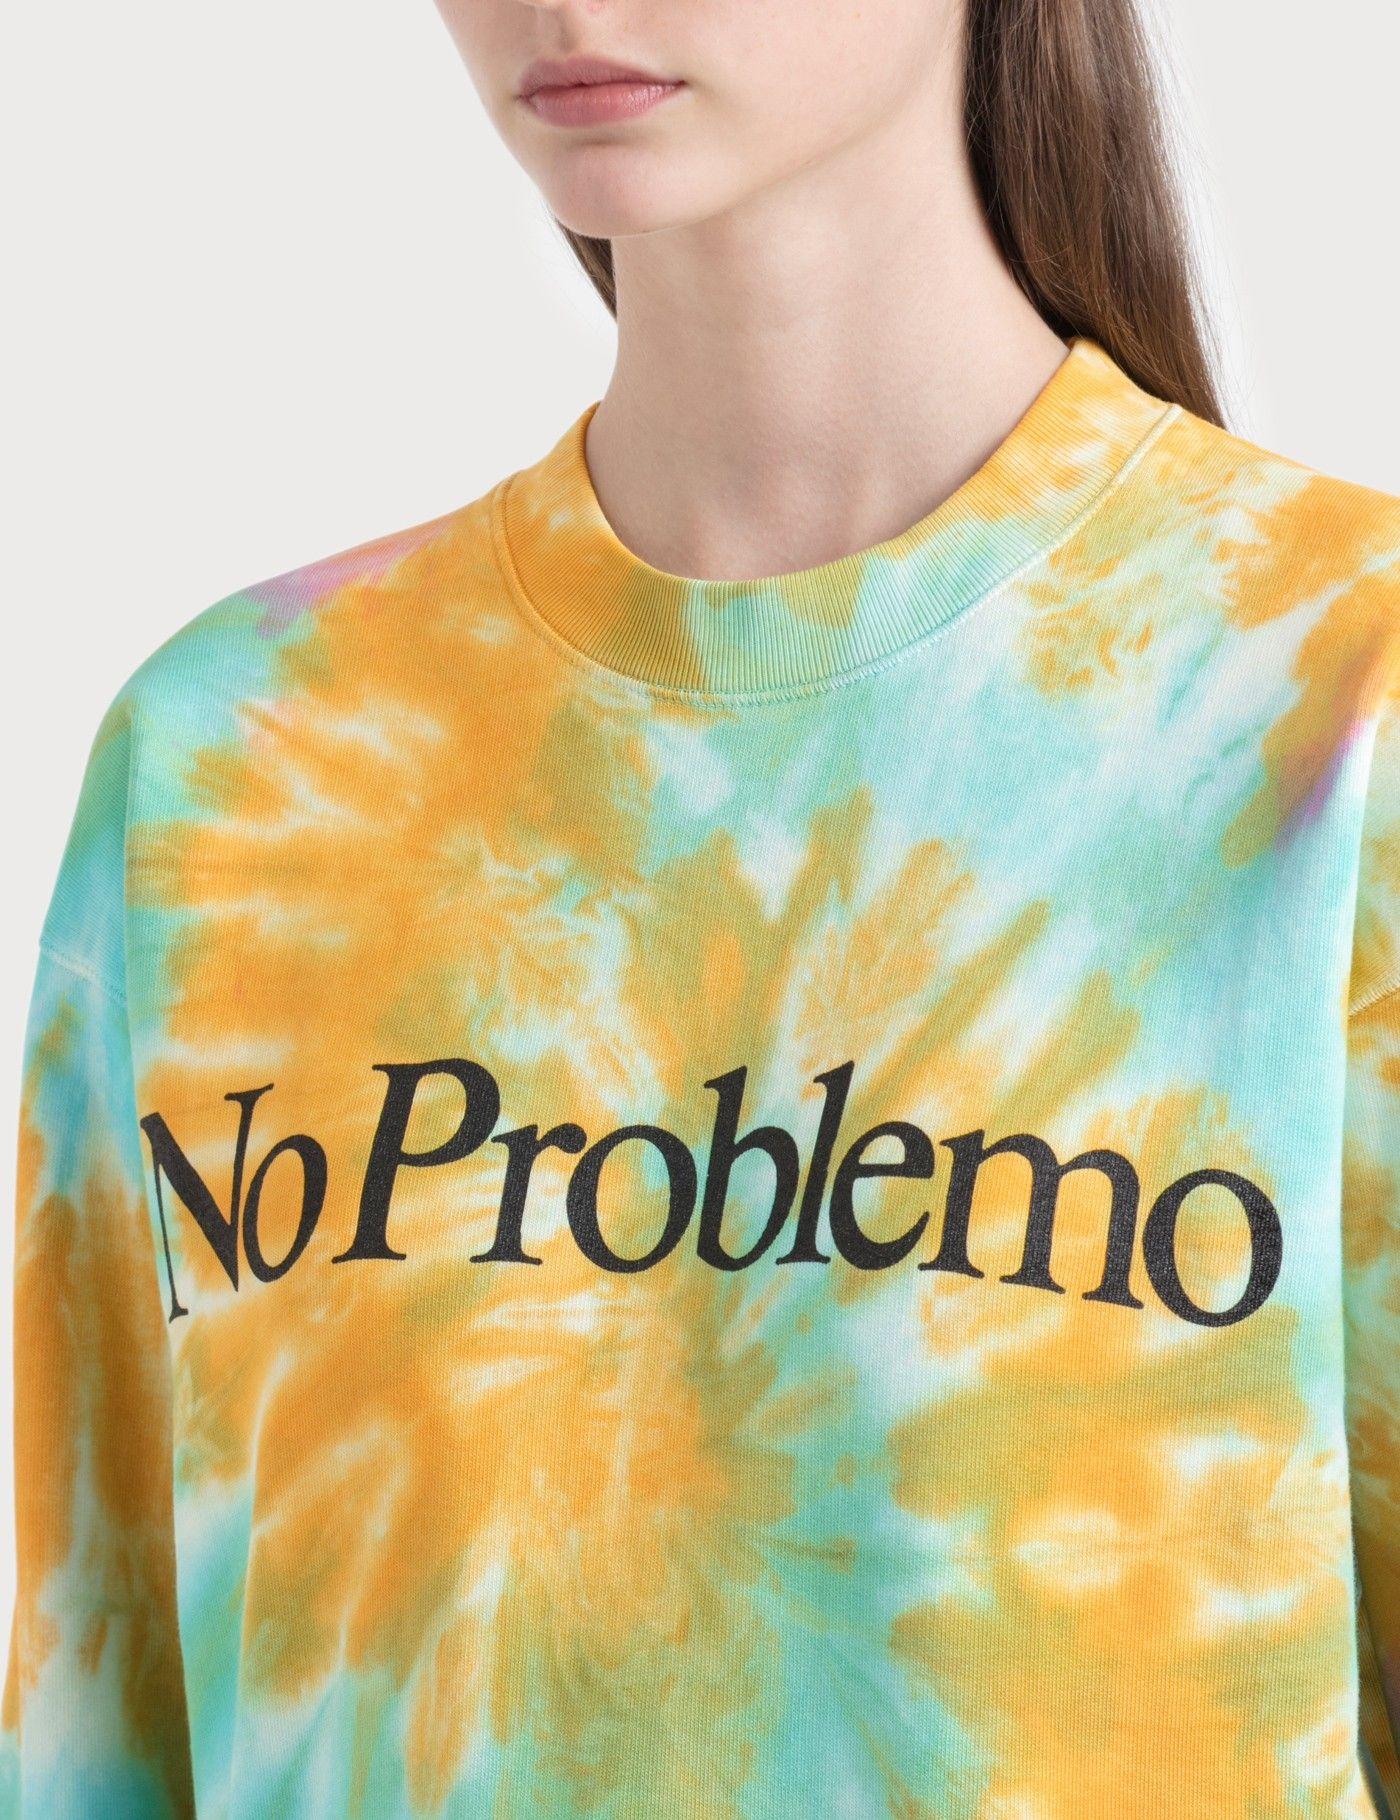 Aries No Problemo Tie Dye Sweatshirt Hbx Tie Dye Sweatshirt Tie Dye Sweatshirts [ 1820 x 1400 Pixel ]